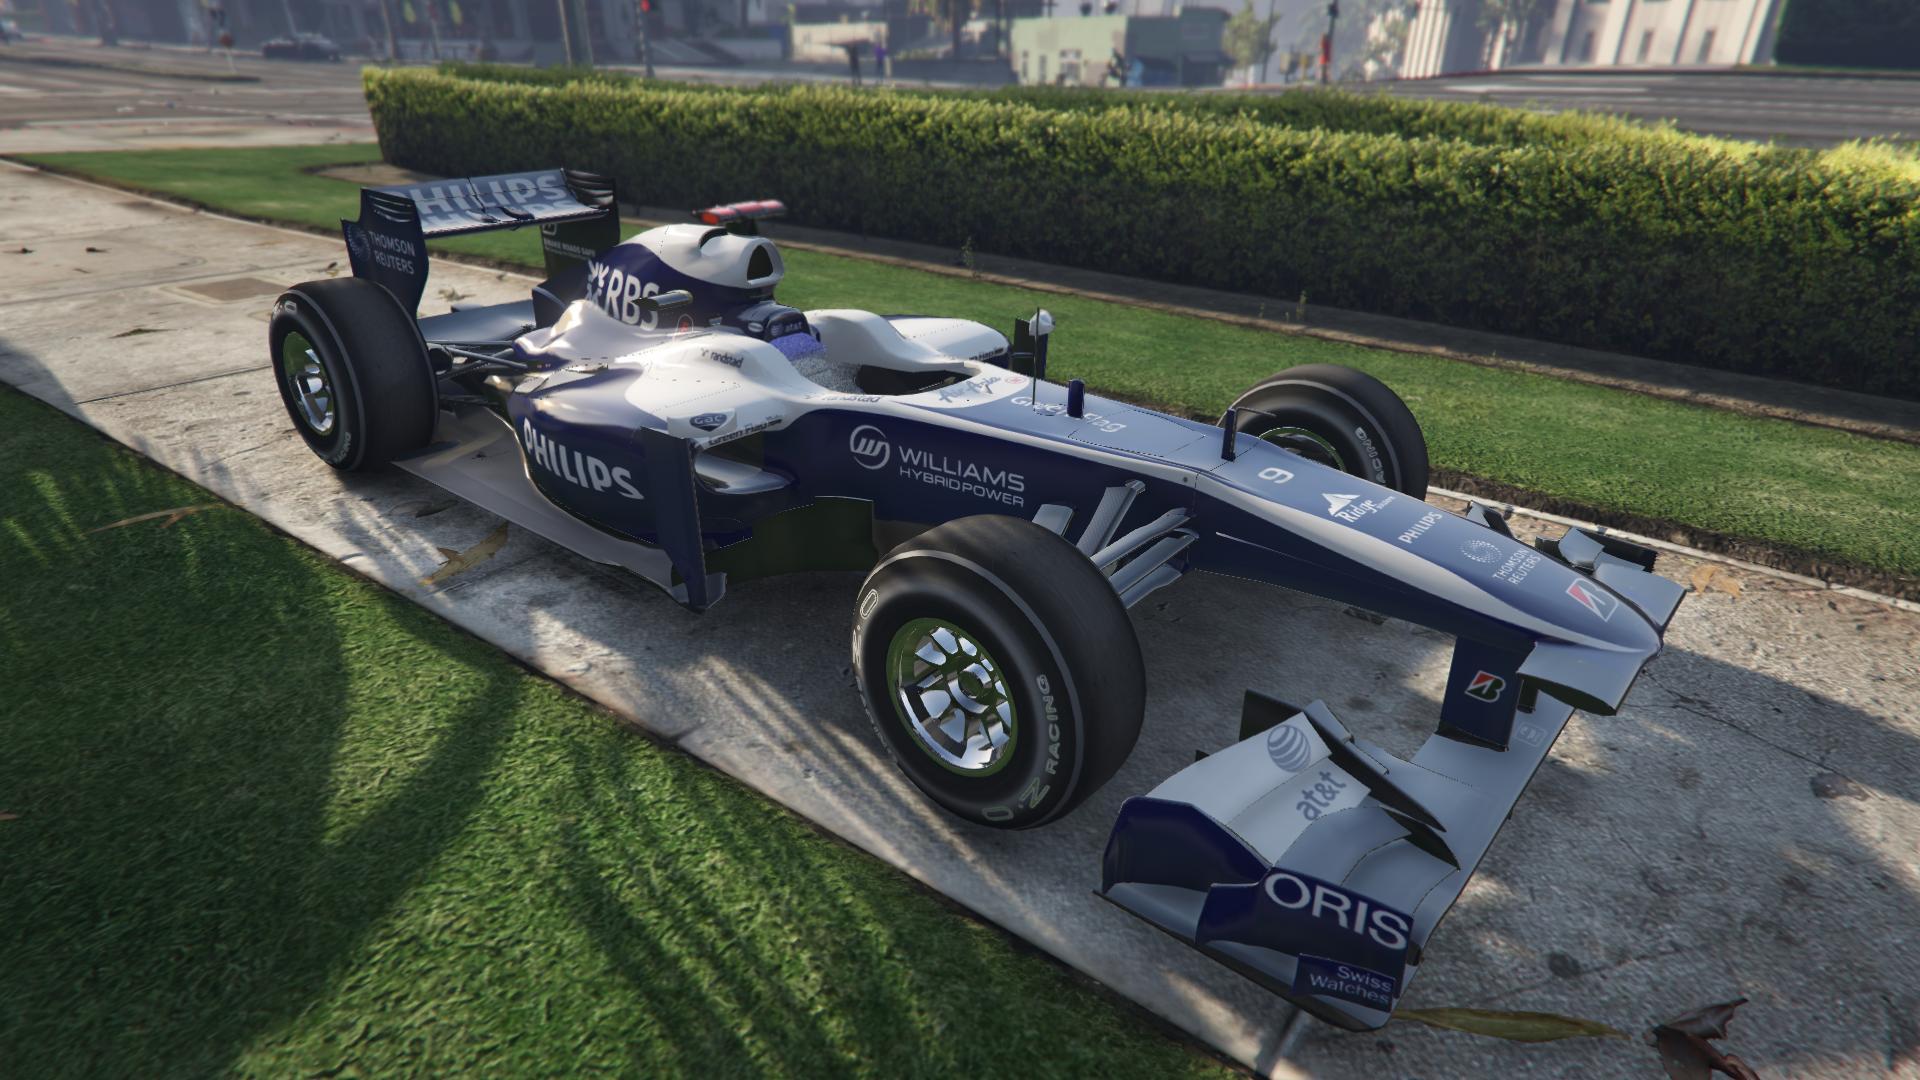 Williams F1 для GTA V - Скриншот 1